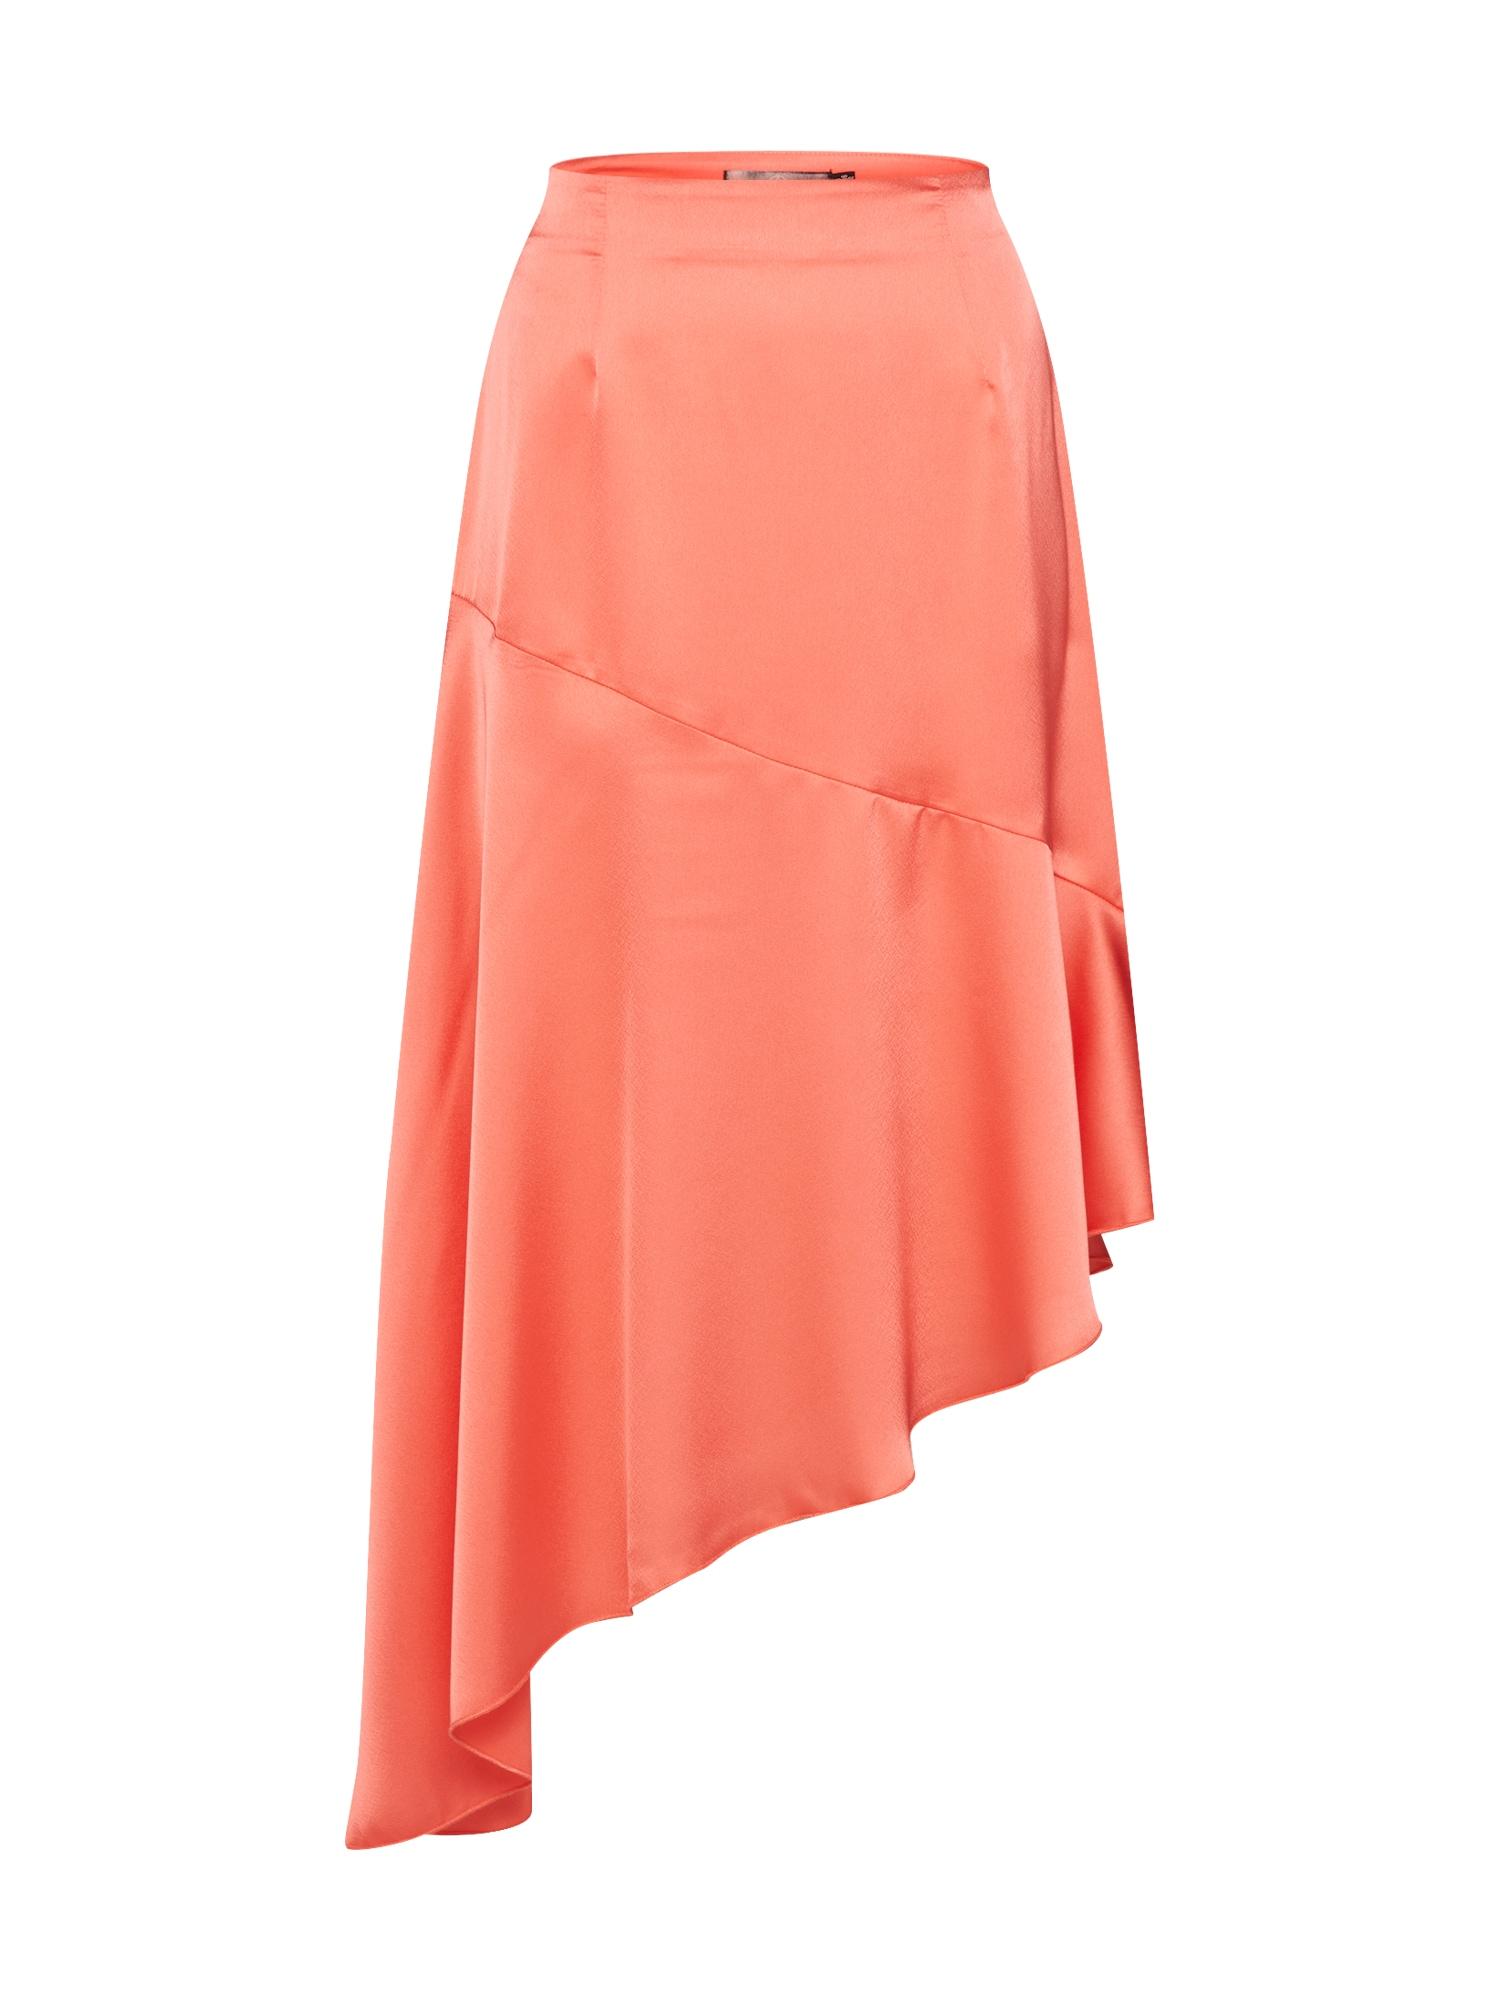 Coral' Asymmetric 'satin Skirt Missguided Rok kXnO08wP